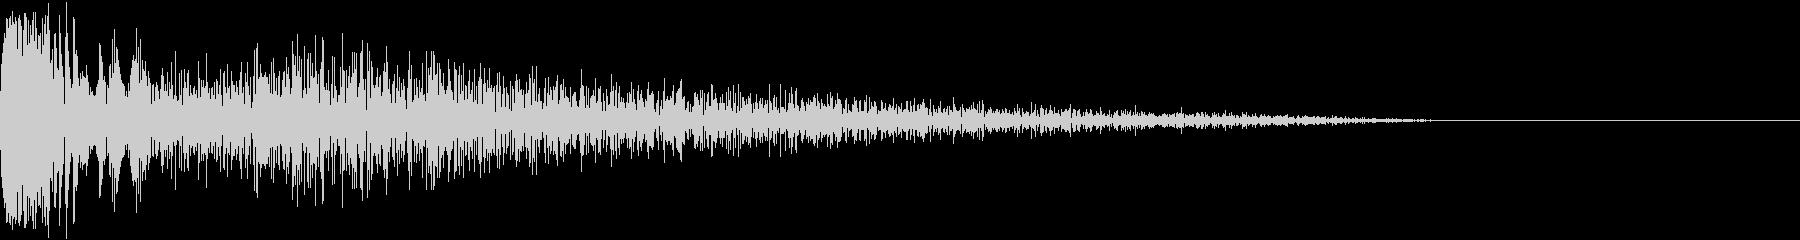 DTM Snare 4 オリジナル音源の未再生の波形